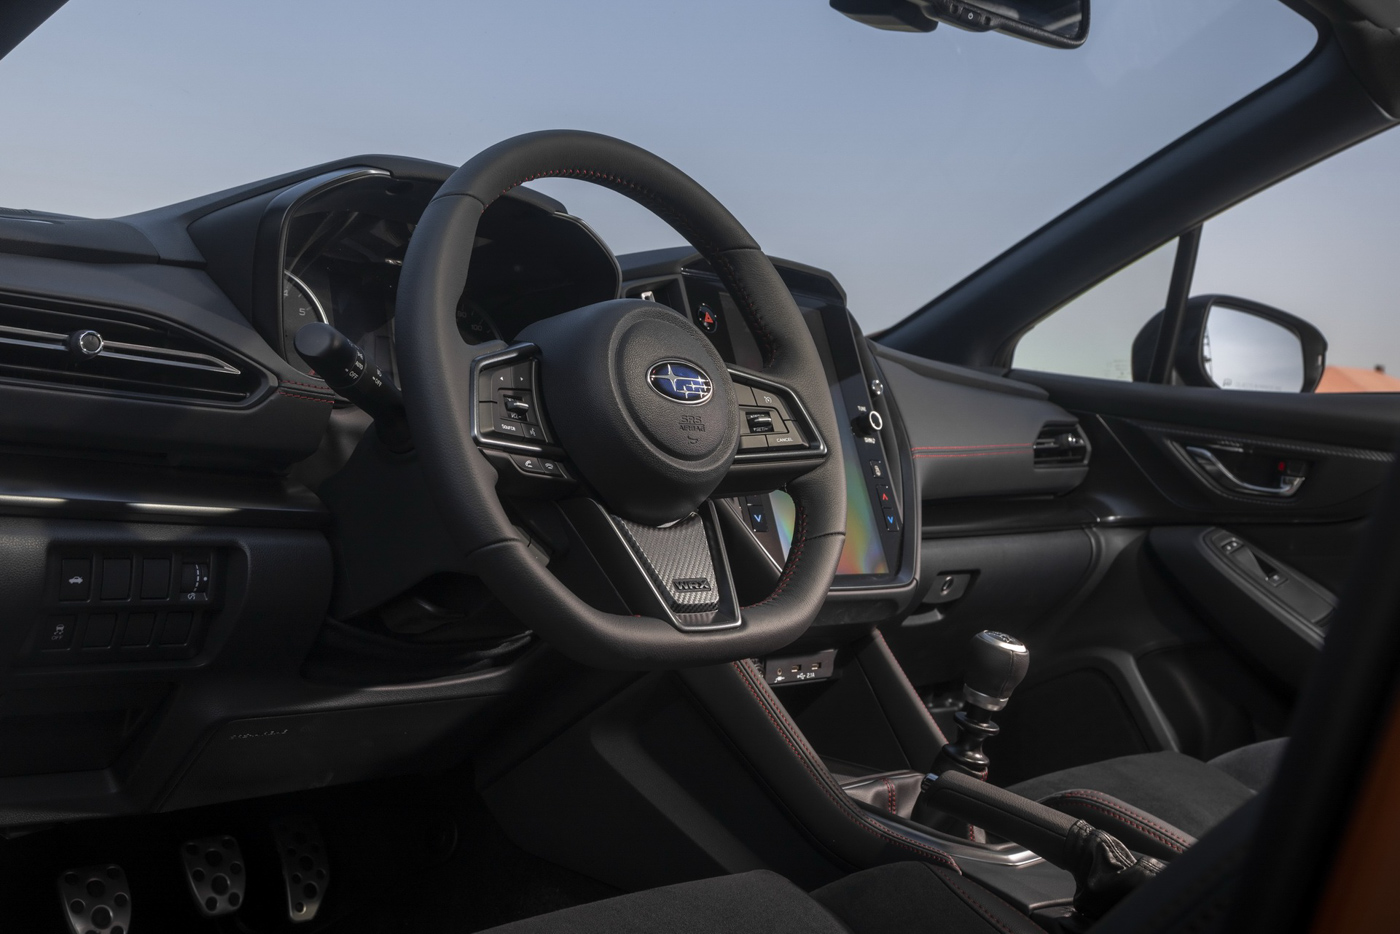 2022 Subaru WRX (11).JPG